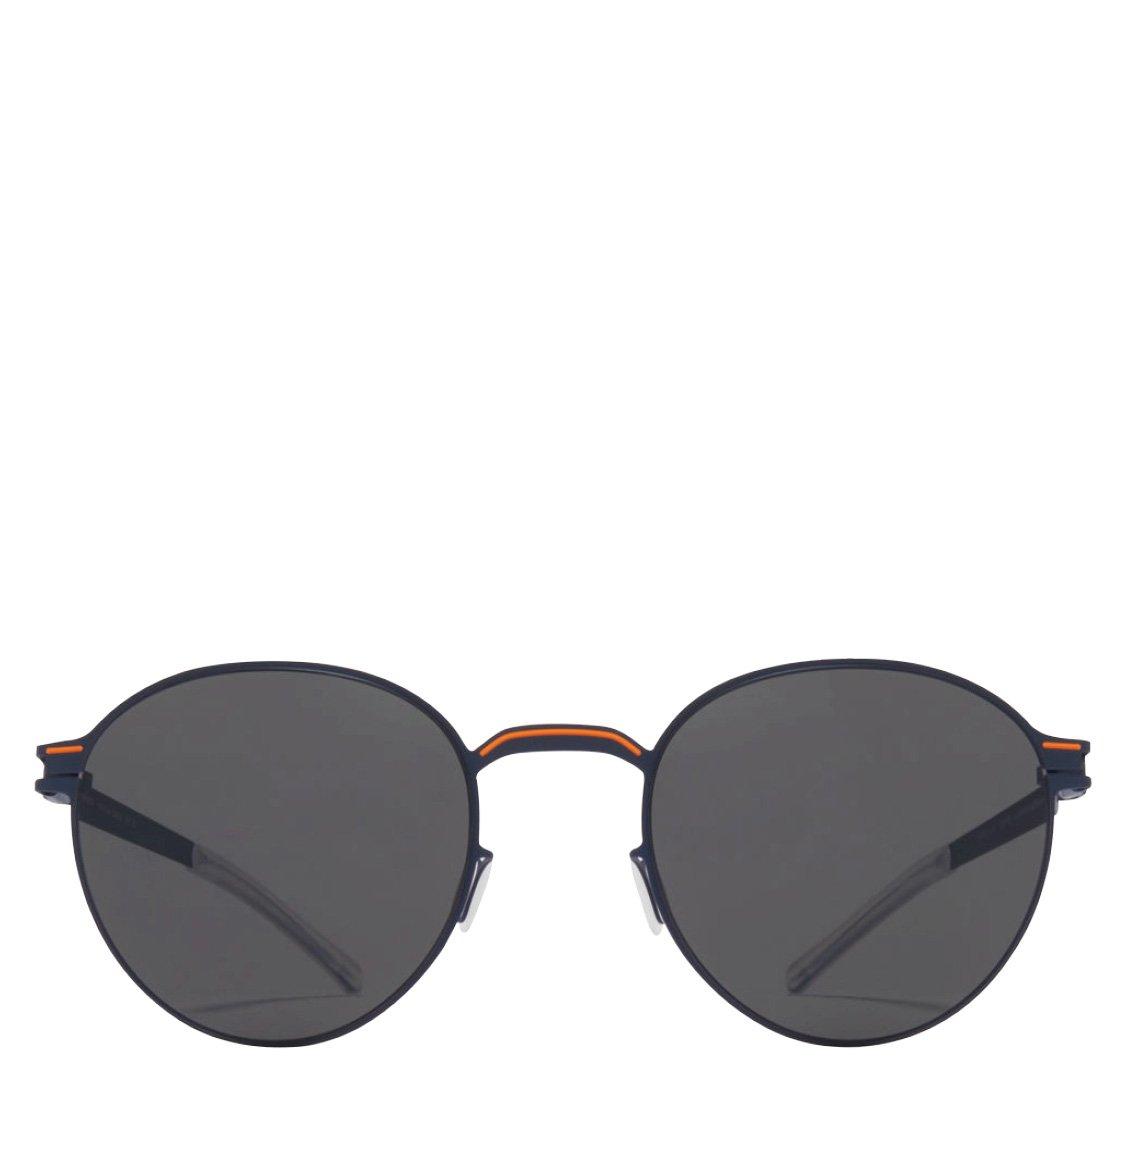 Mykita Panto Shaped Frame Indigo Sunglasses